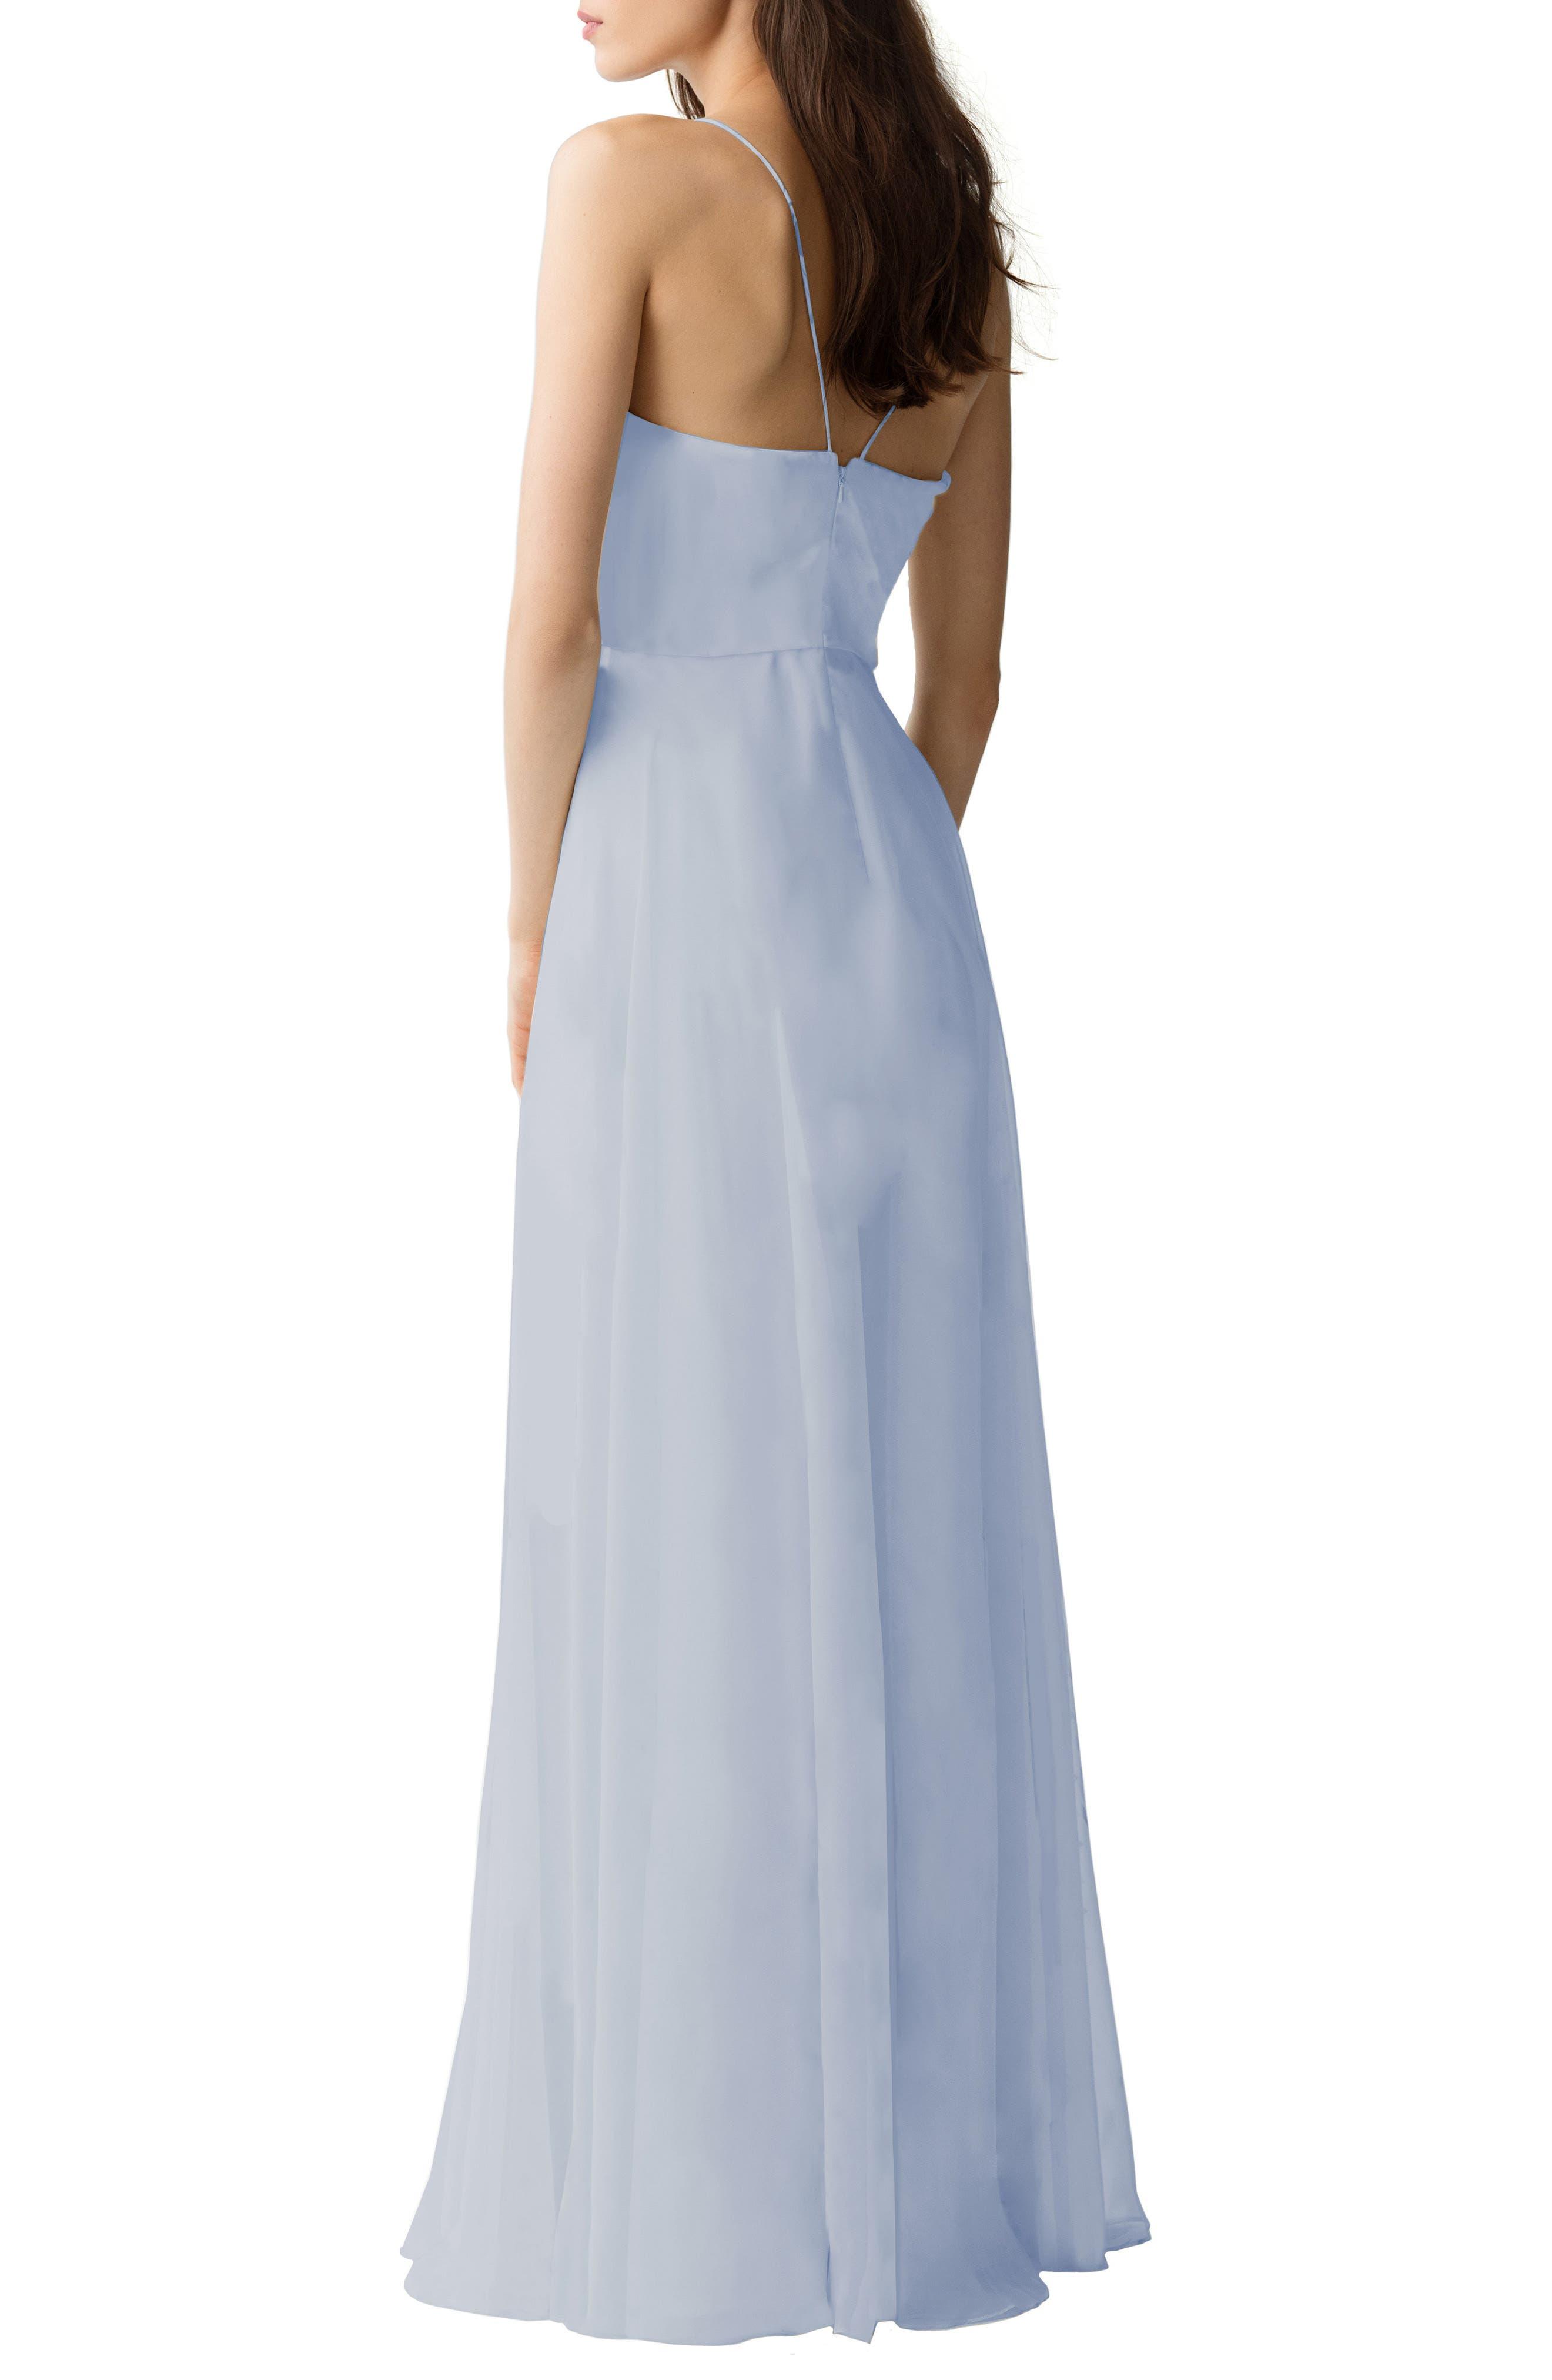 Inesse Chiffon V-Neck Spaghetti Strap Gown,                             Alternate thumbnail 2, color,                             Whisper Blue